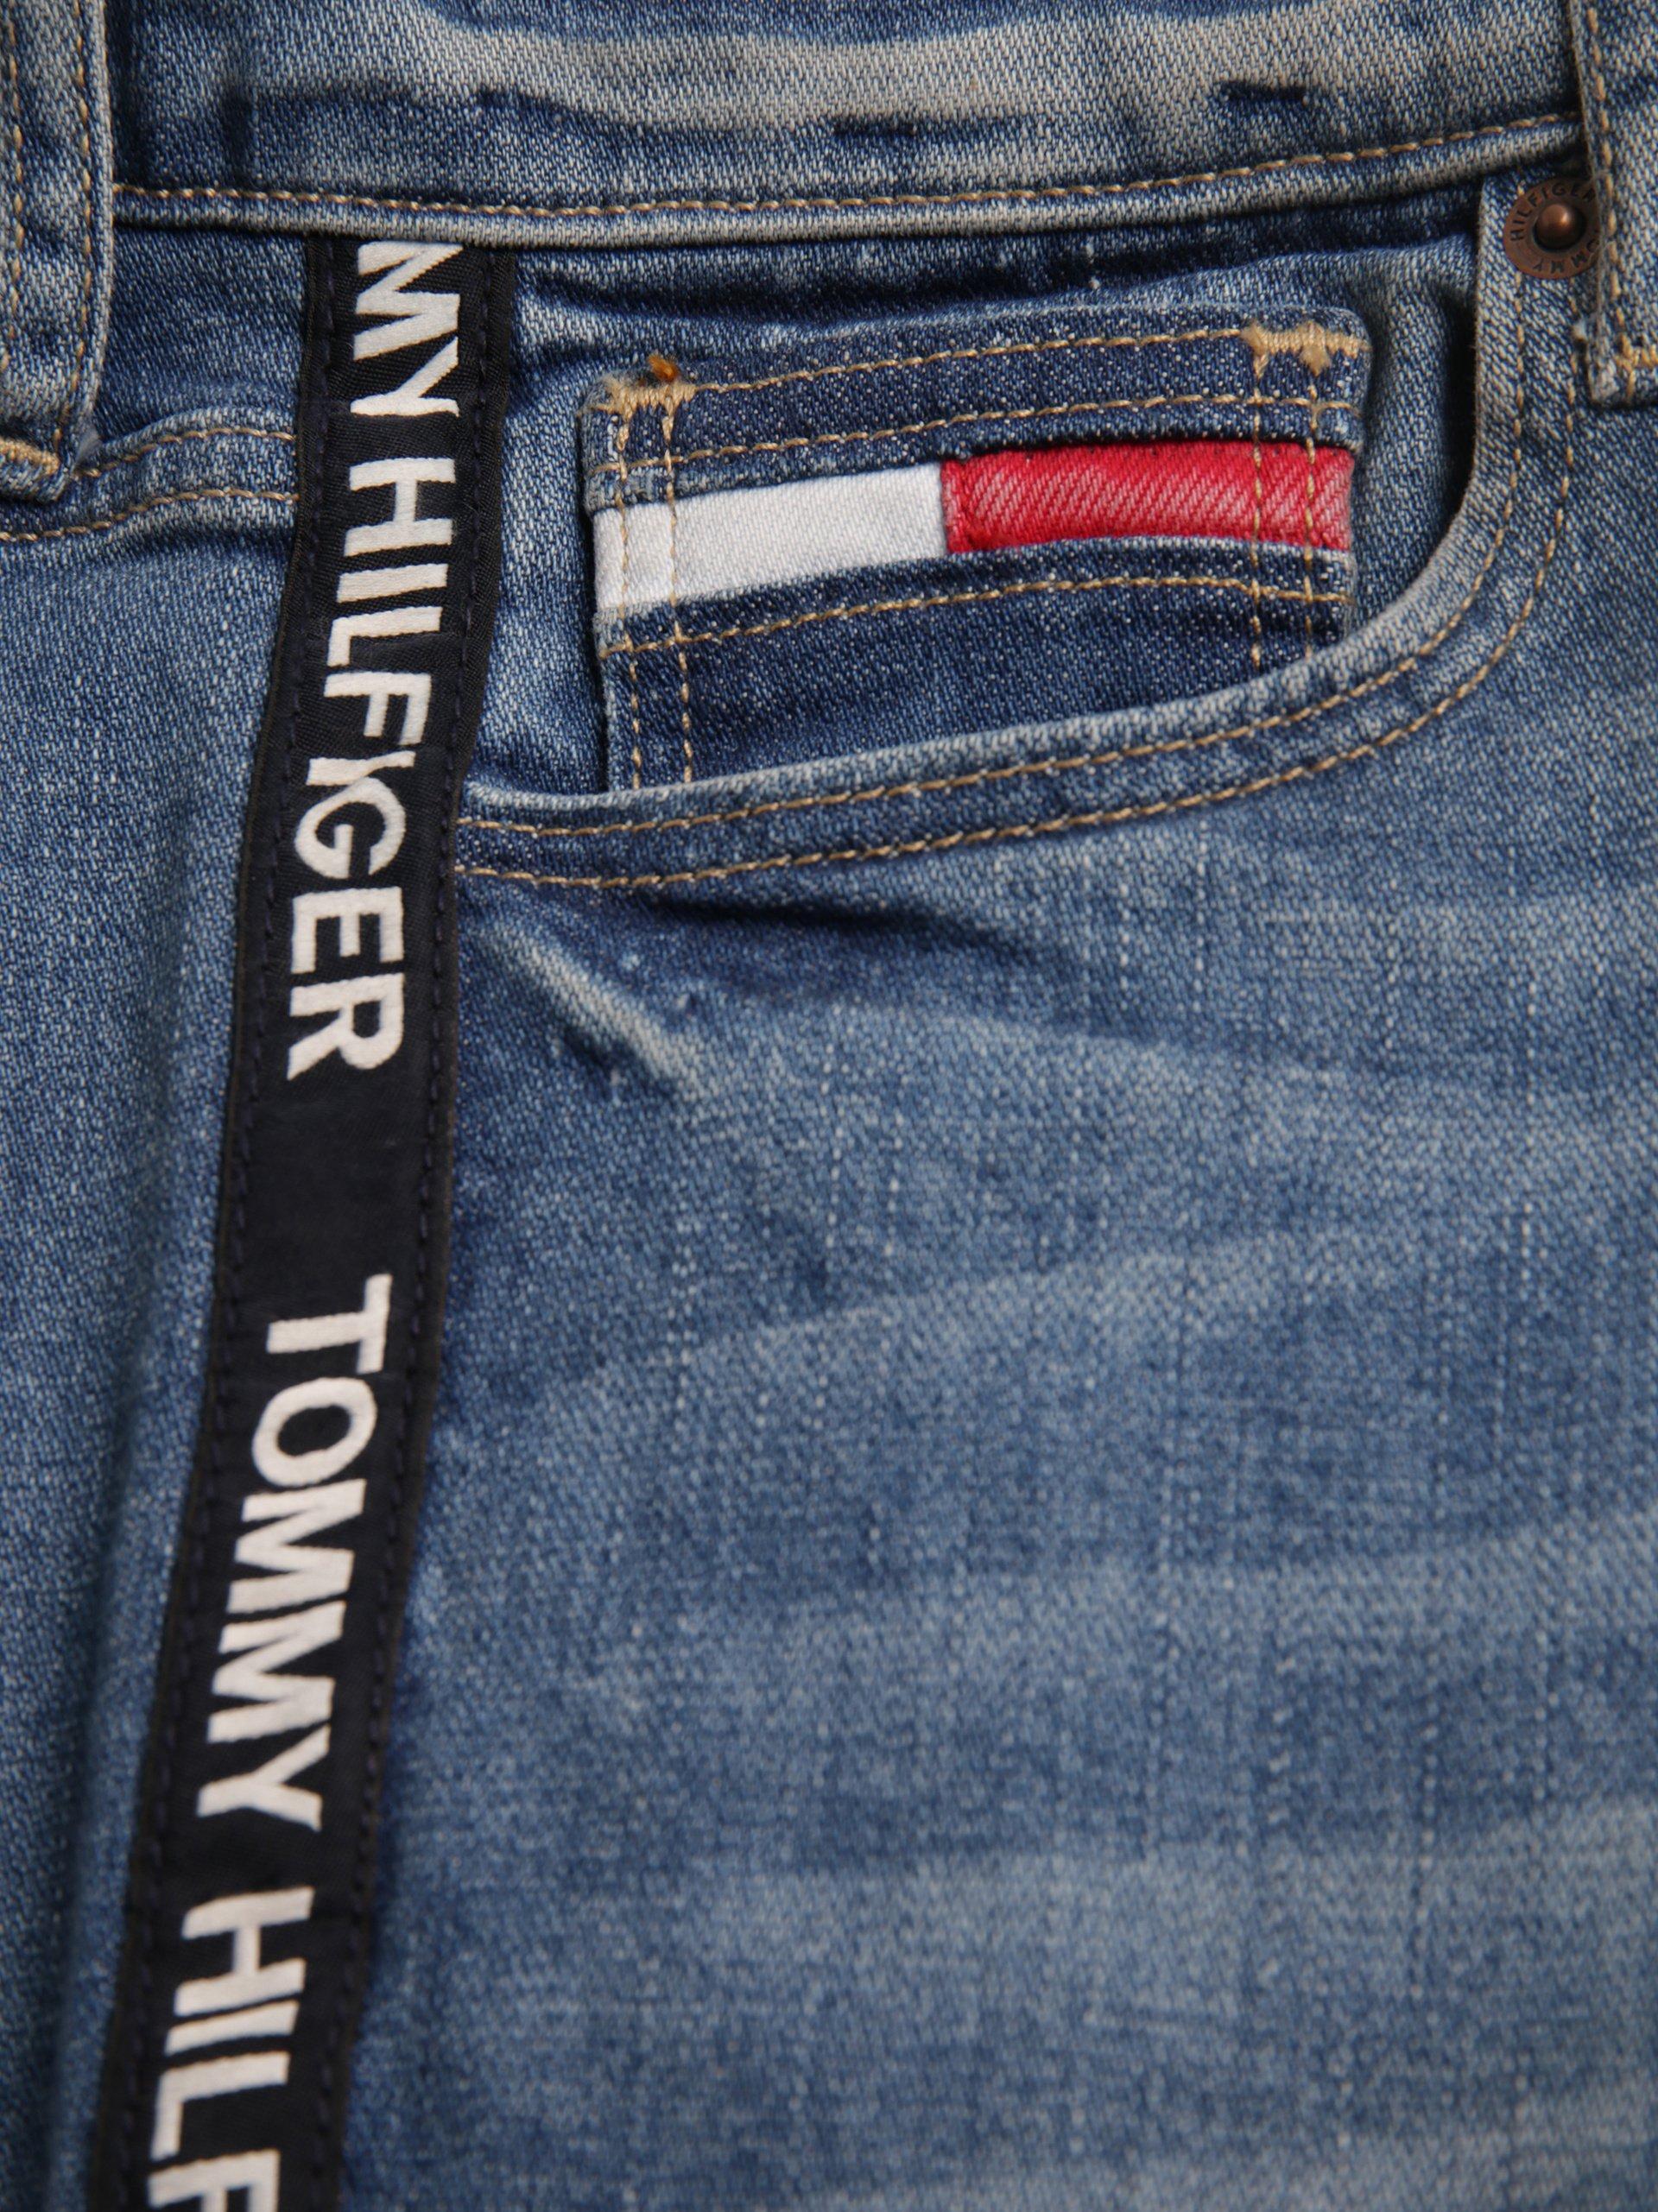 Tommy Hilfiger Jungen Jeans Straight Fit